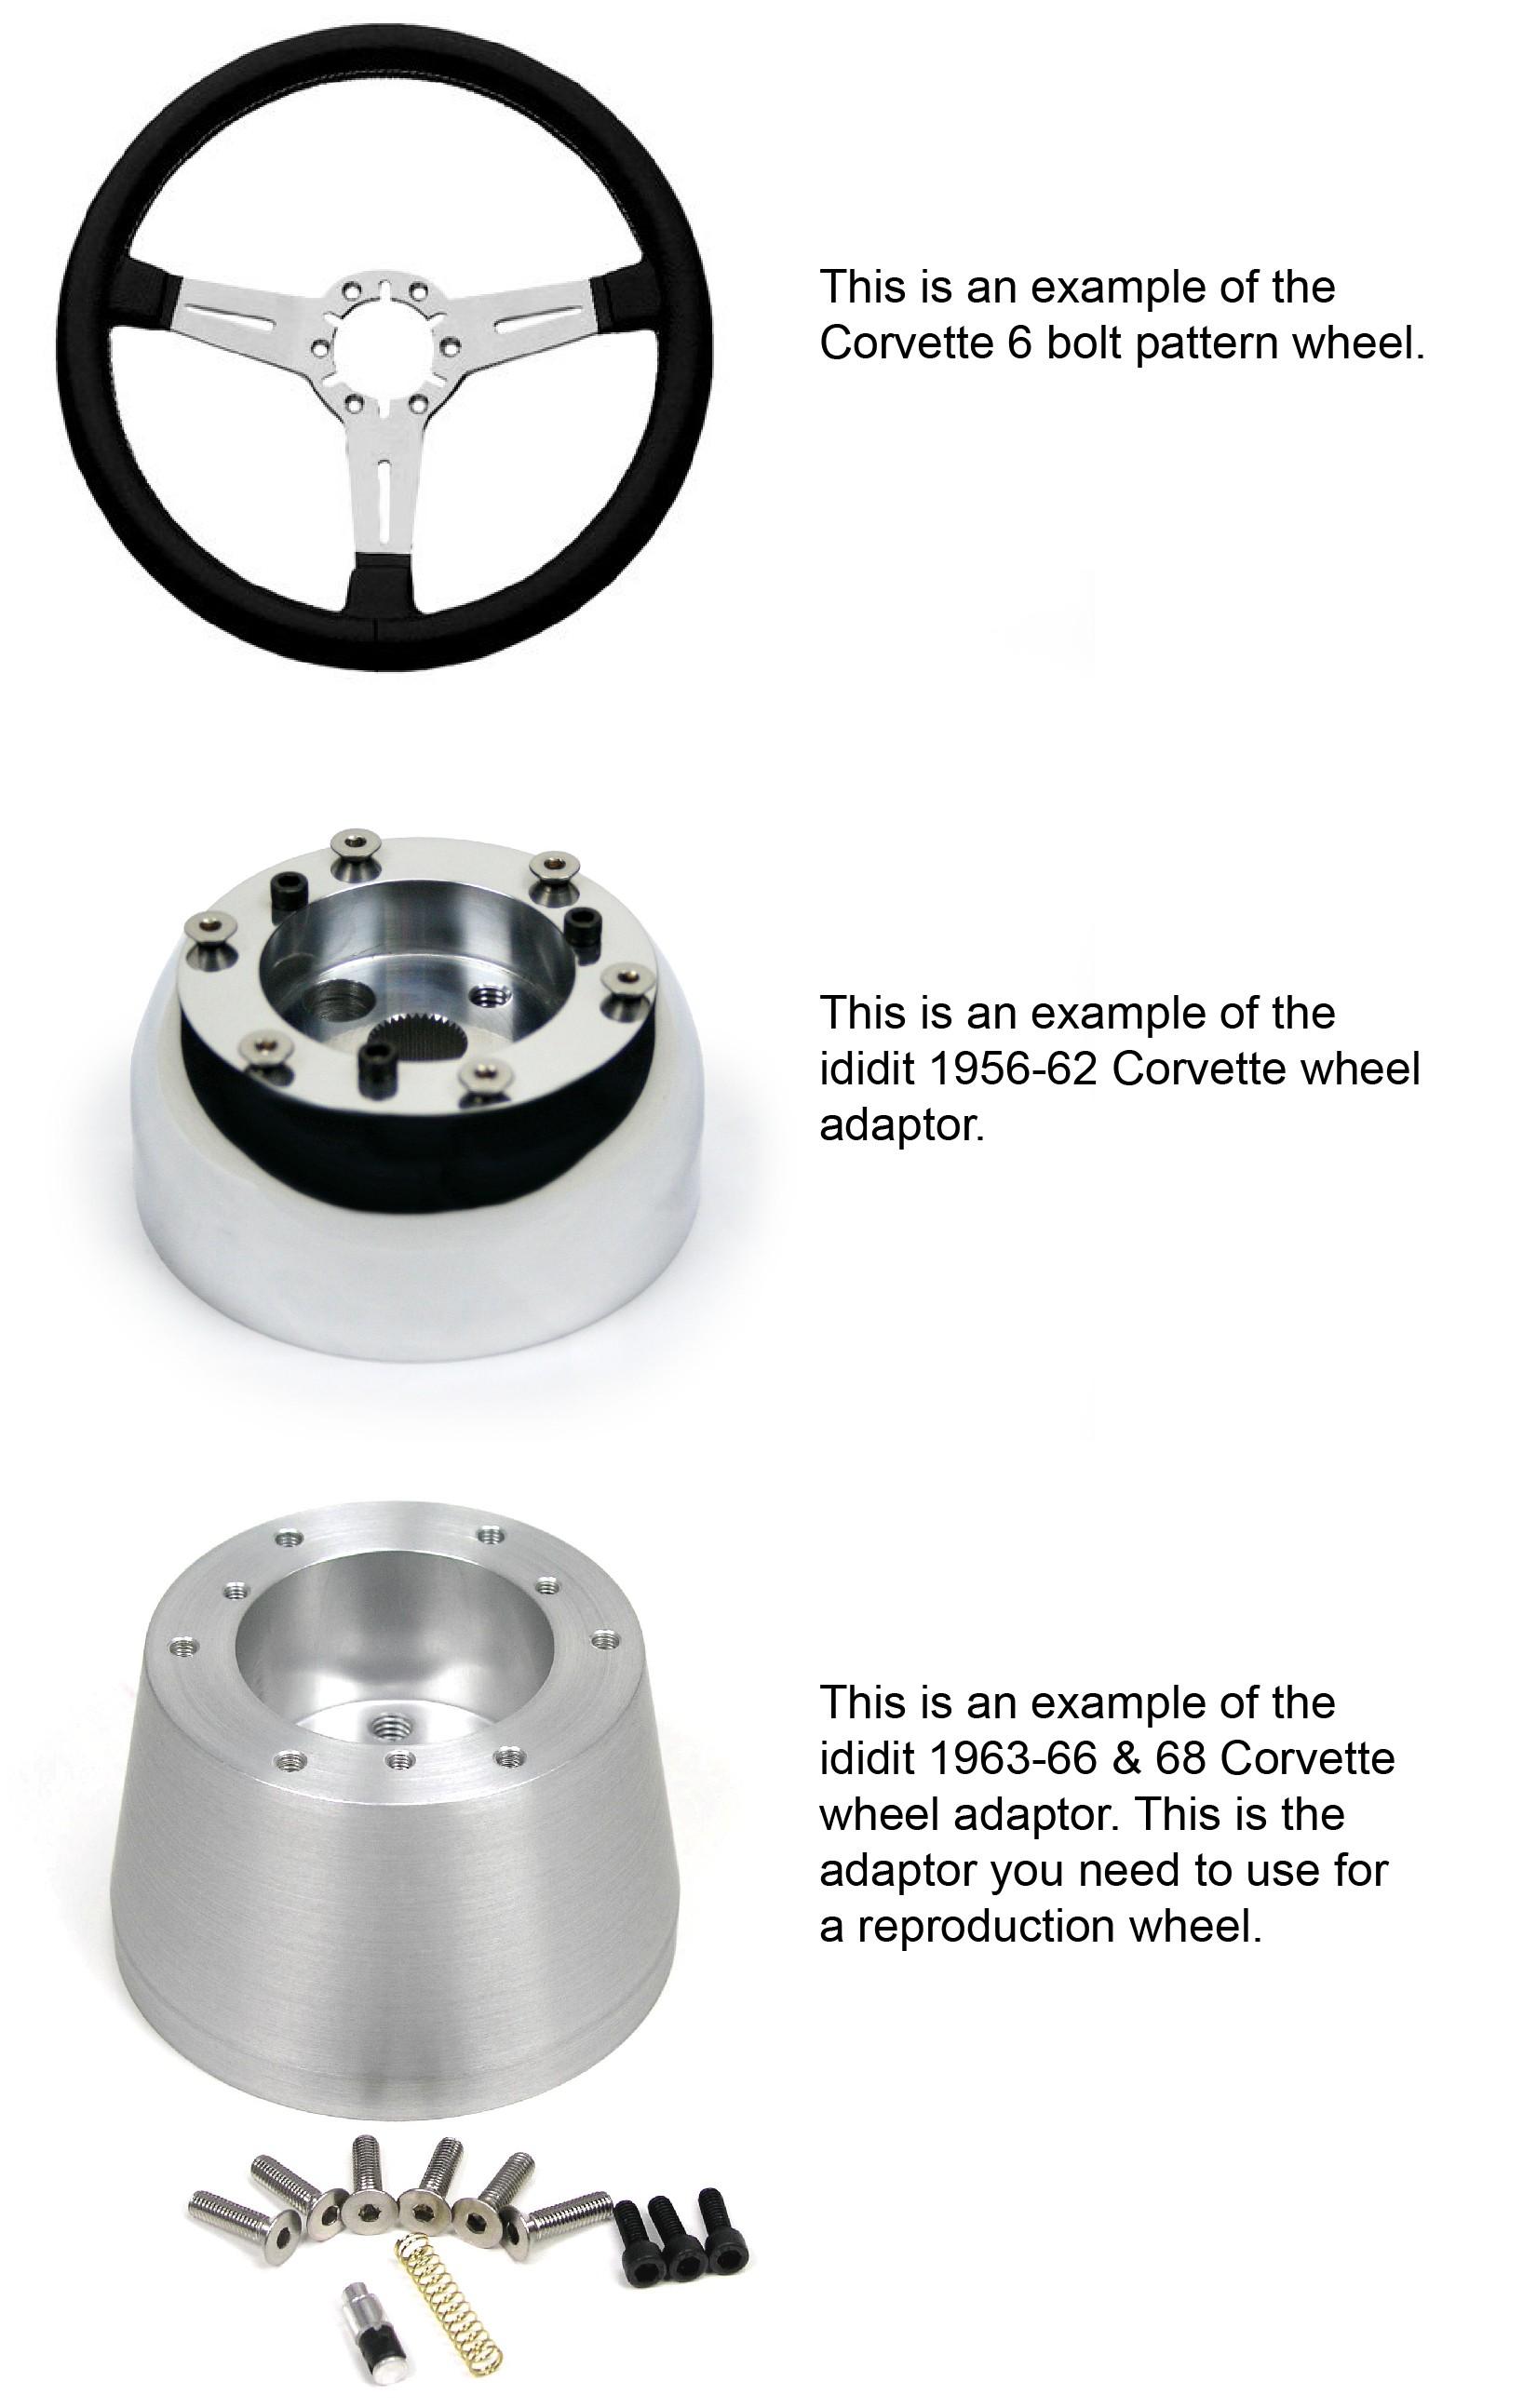 Ididit Steering Column Wiring Diagram Tech Tips Of Ididit Steering Column Wiring Diagram